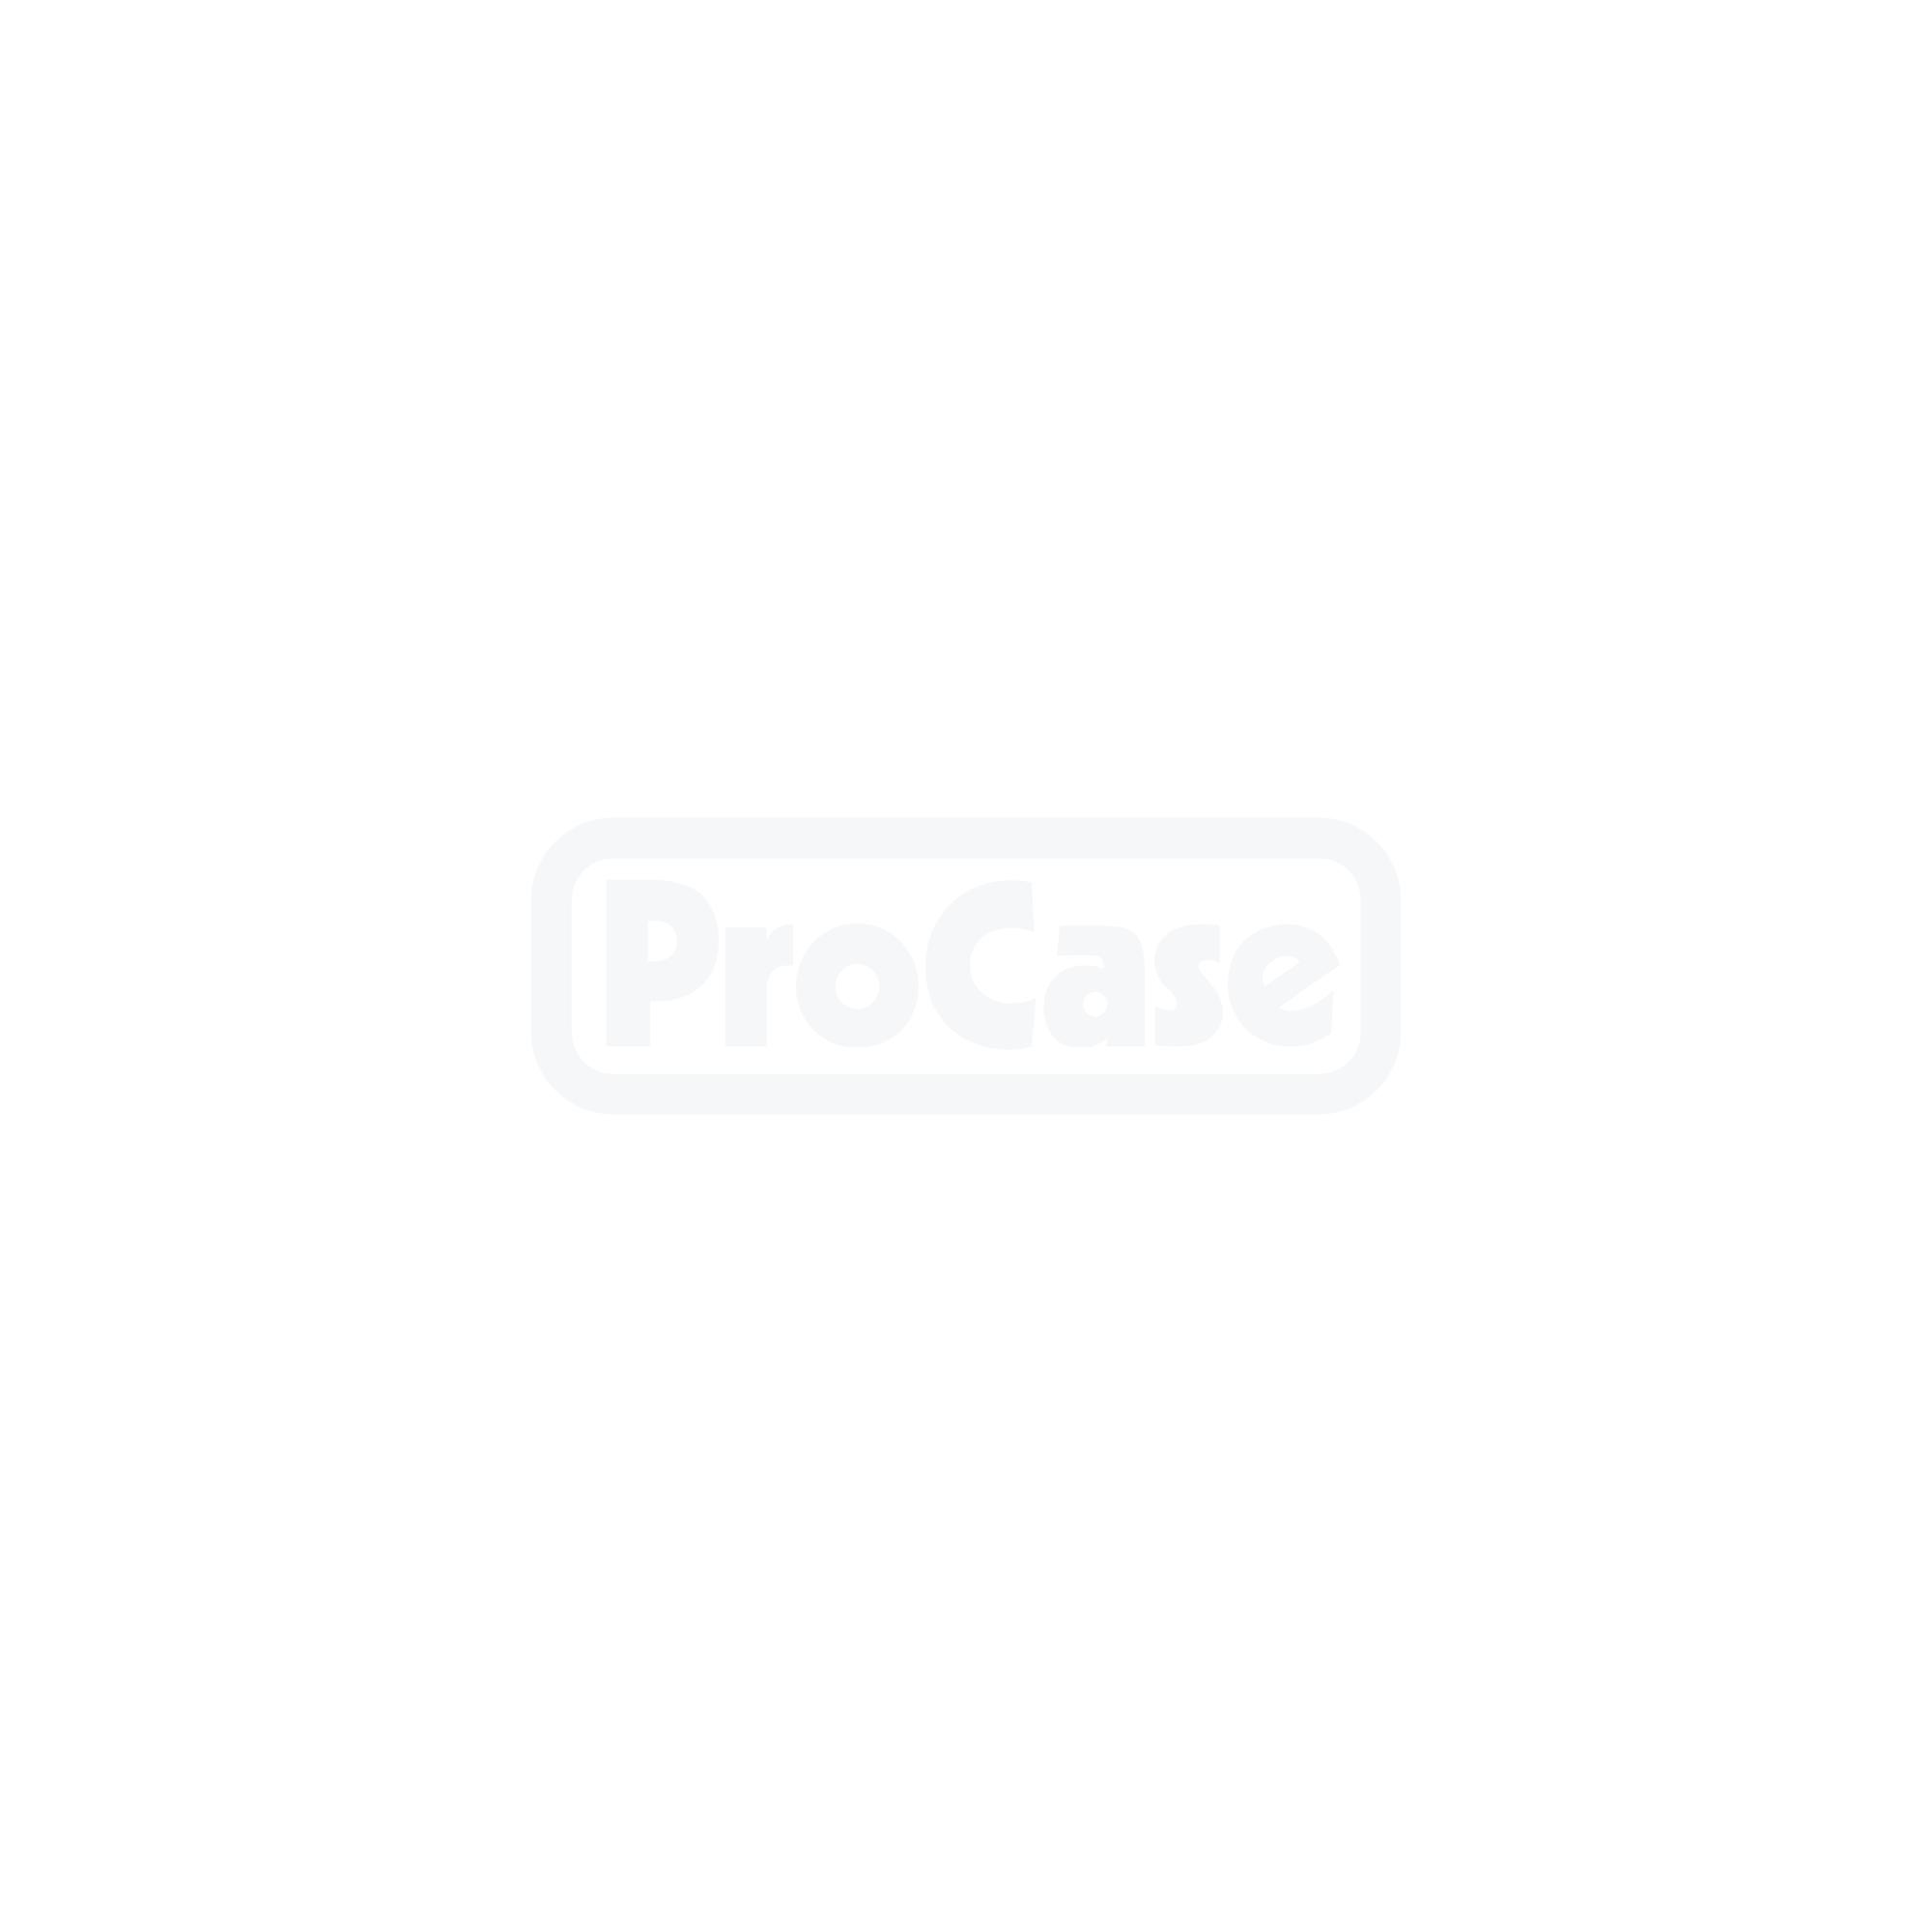 Transportcase Vario-Flex 90 Plus 750 mm hoch 3